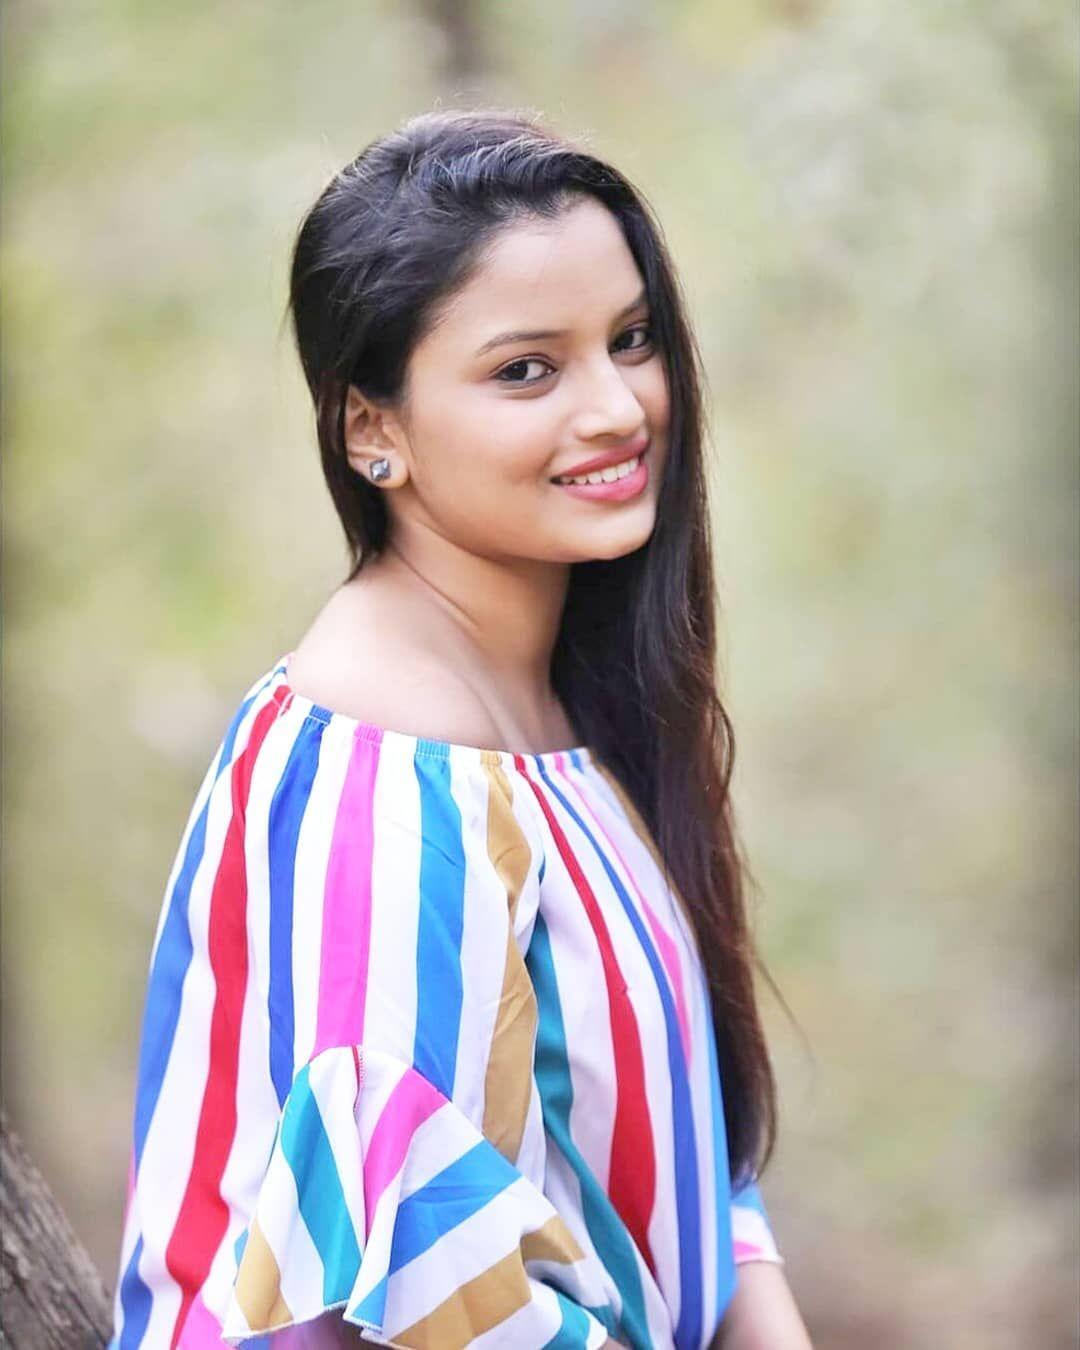 मनमोहक राजेश्वरी खरात | Beautiful Rajeshwari Kharat #rajeshwarikharat  #marathiactress | Tie dye top, Dyed tops, Striped top